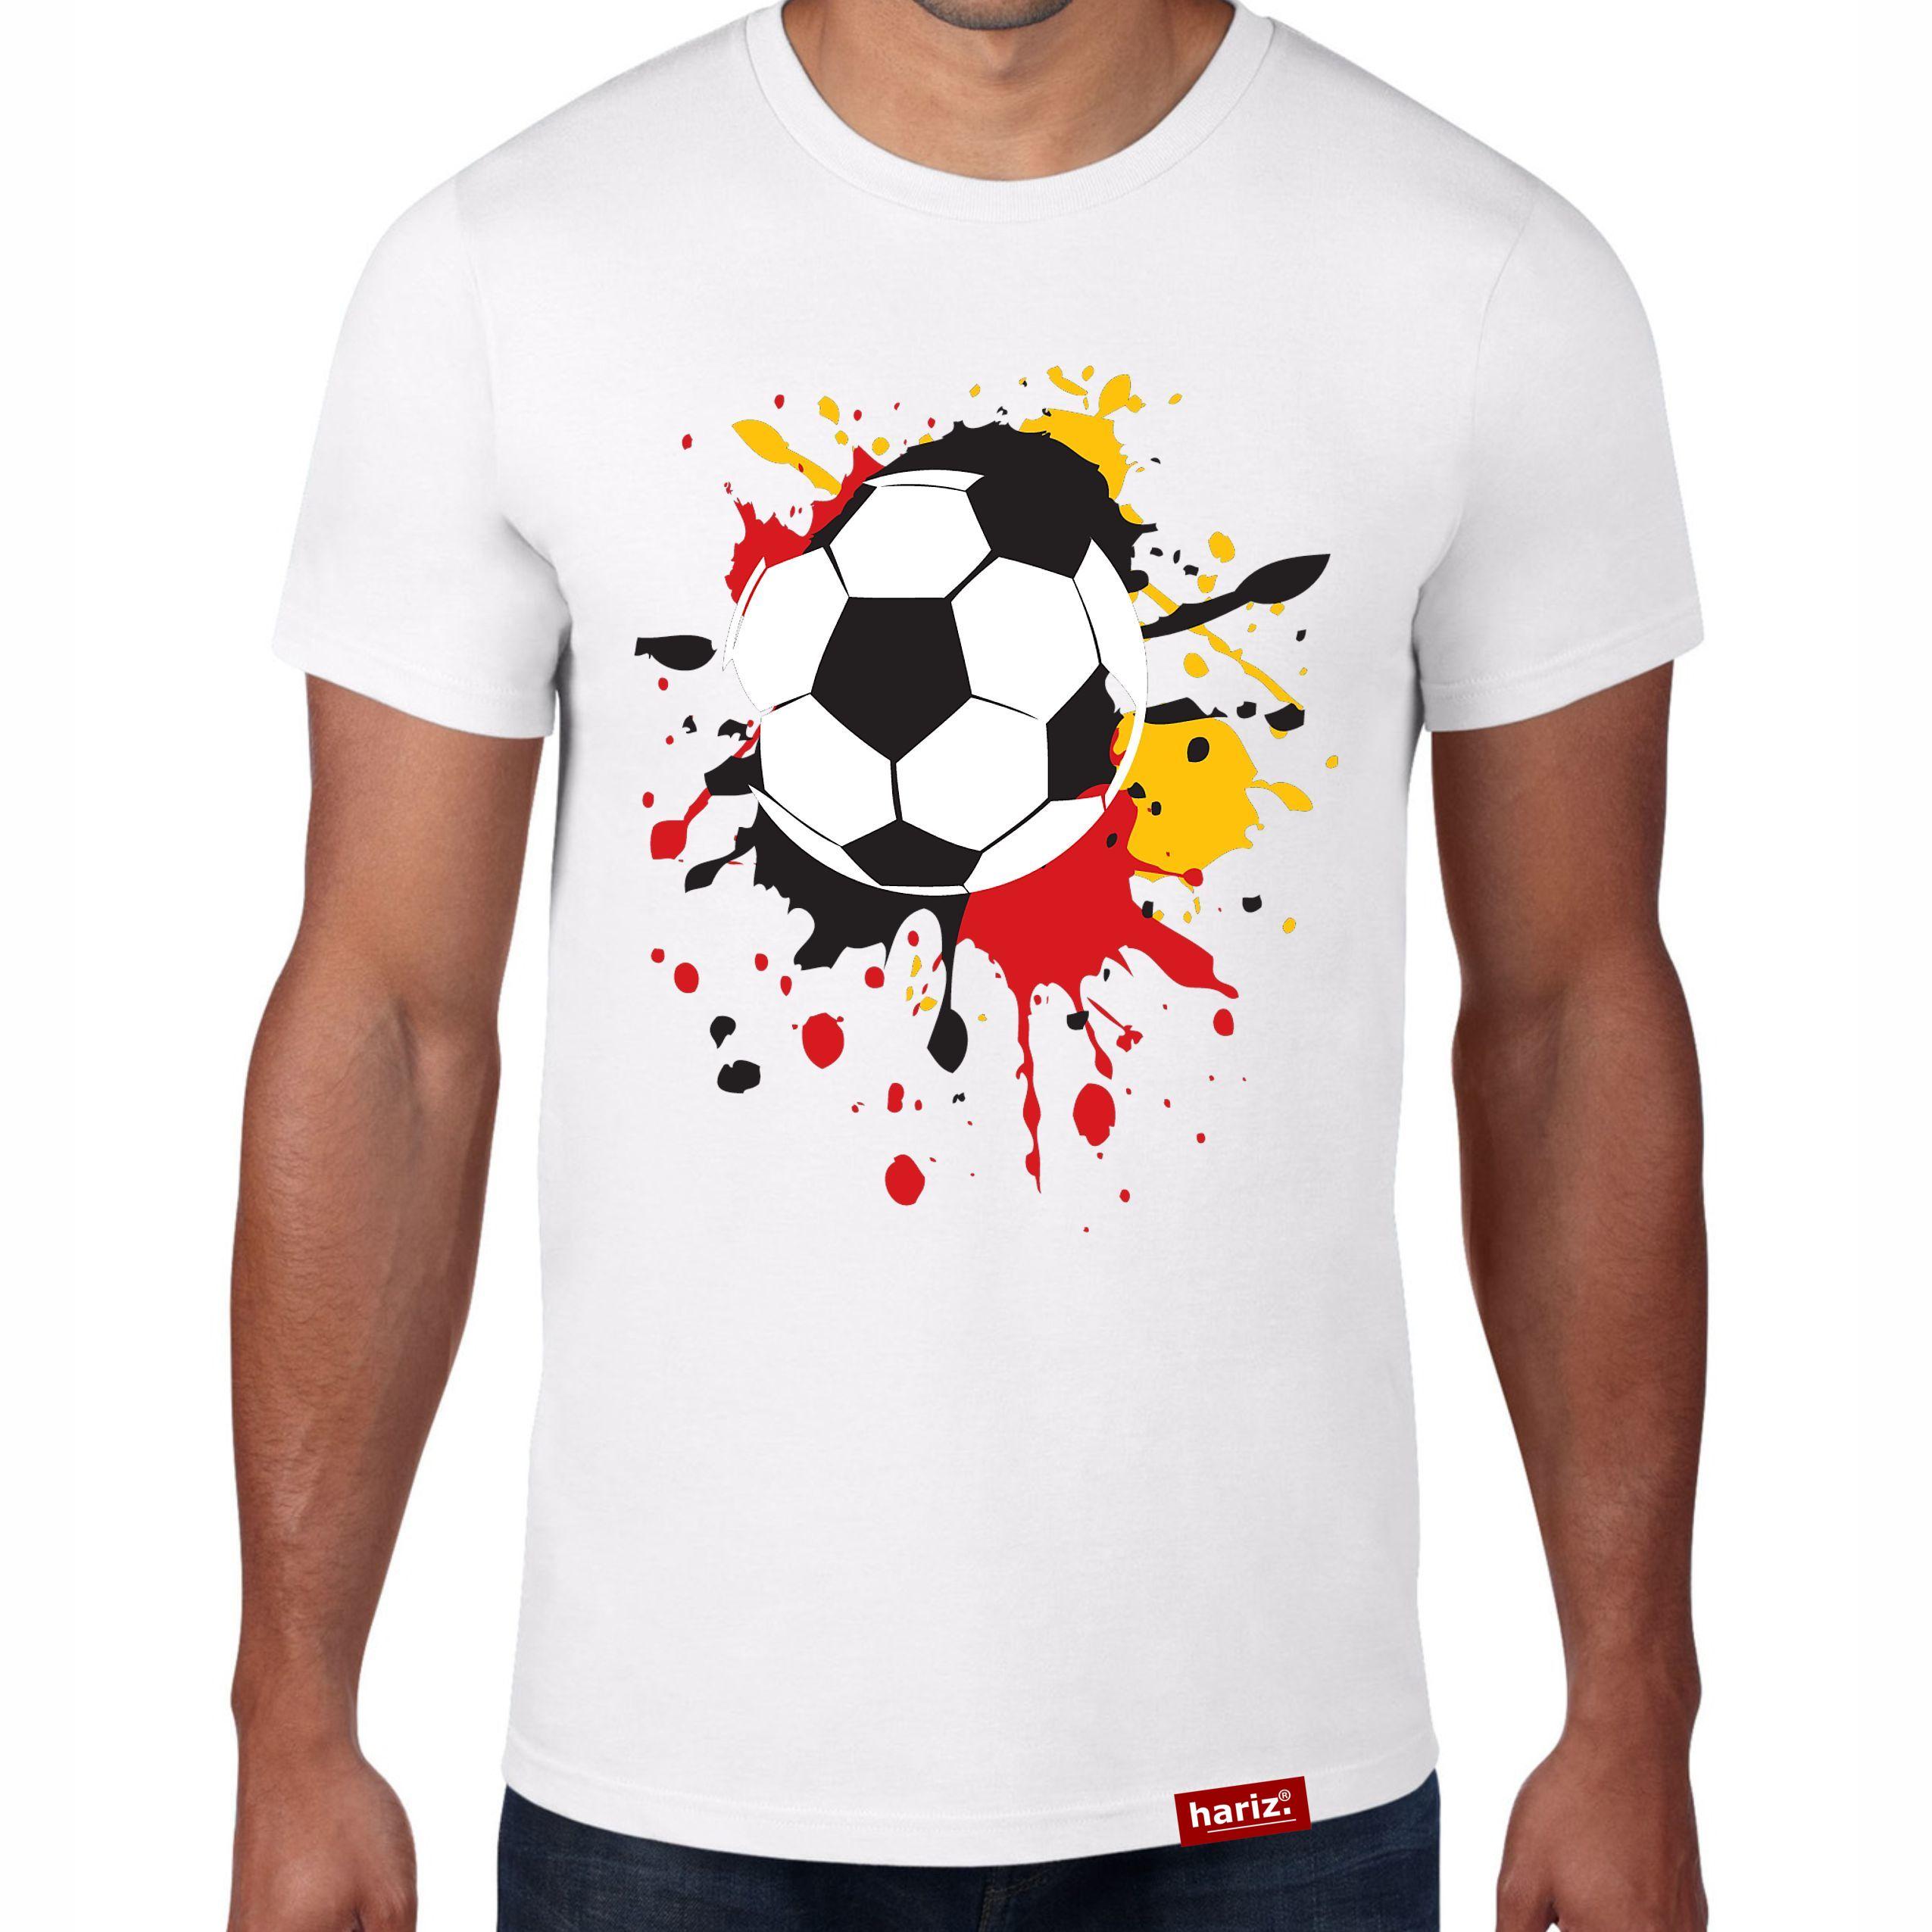 Wunderbar Fußball Helm Färbung Seite Fotos - Framing Malvorlagen ...